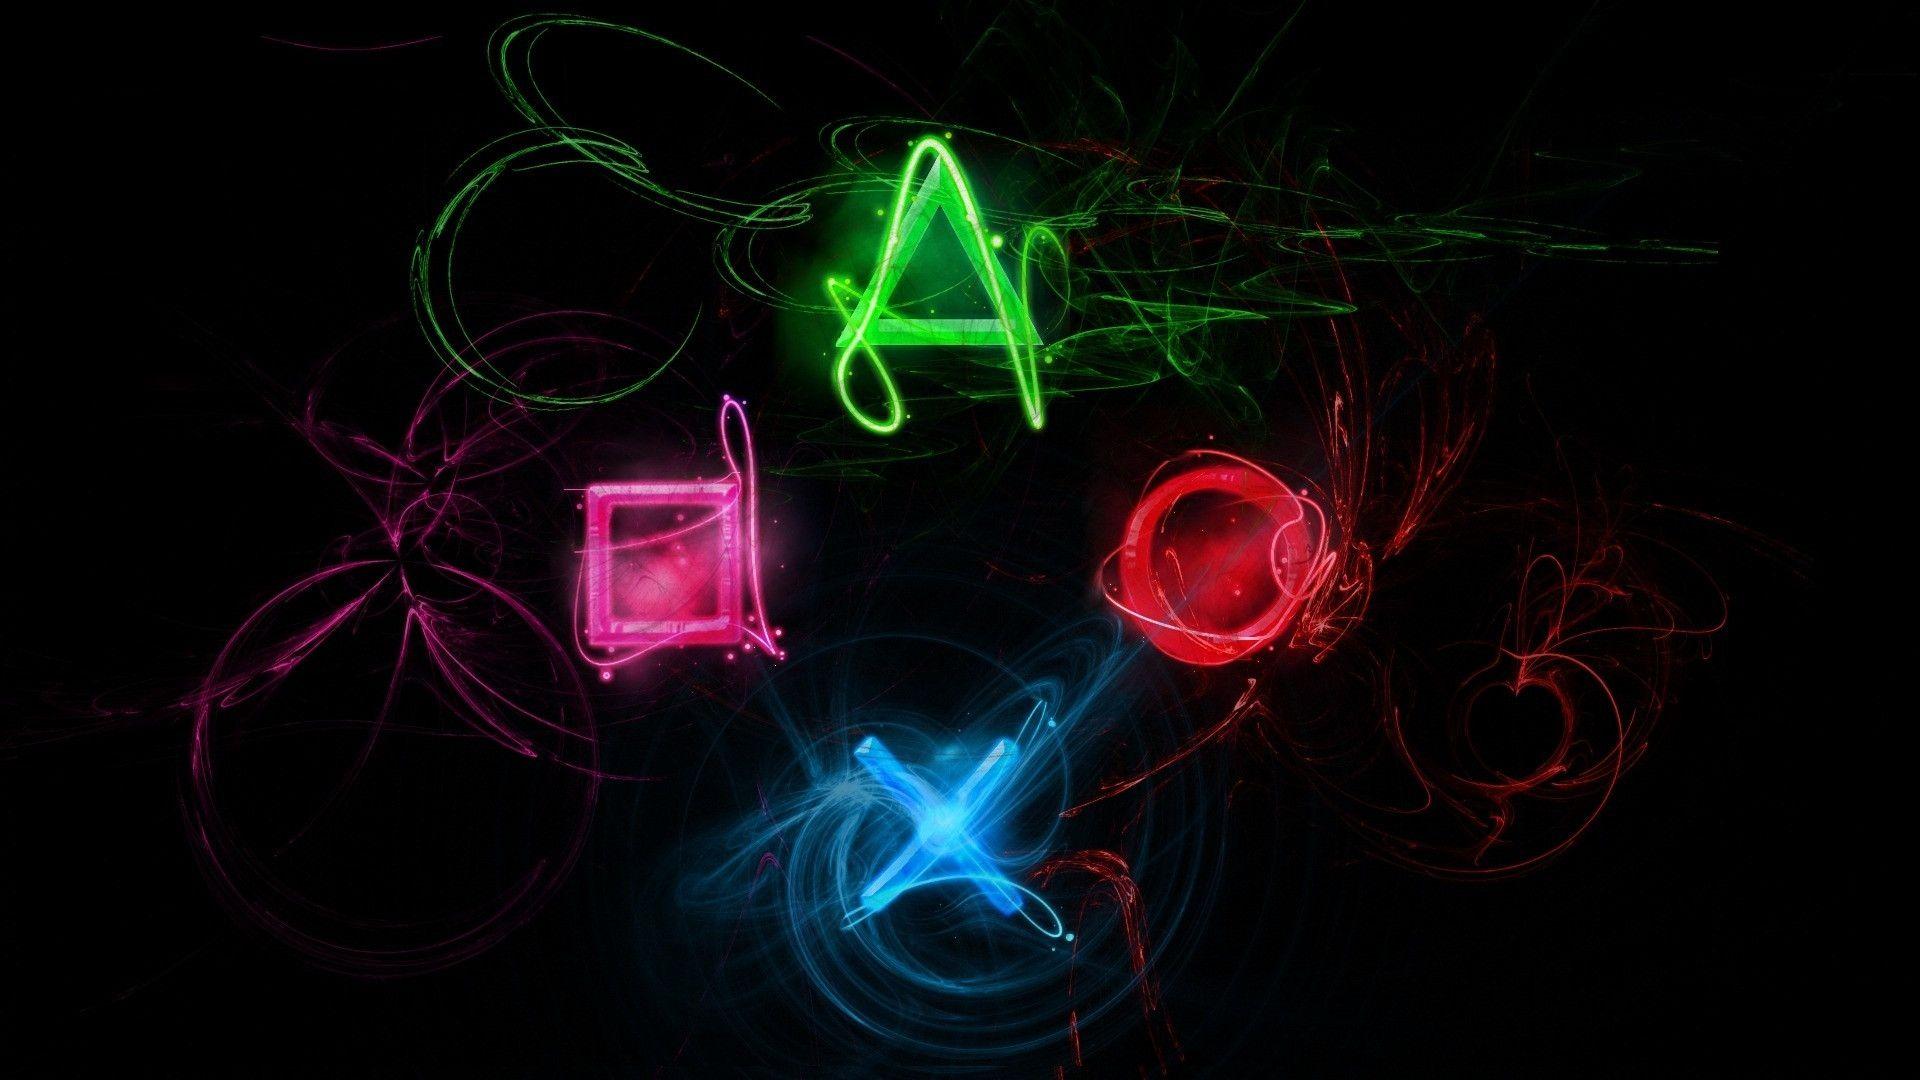 Sony Playstation 3 HD desktop wallpaper : Widescreen : High ...